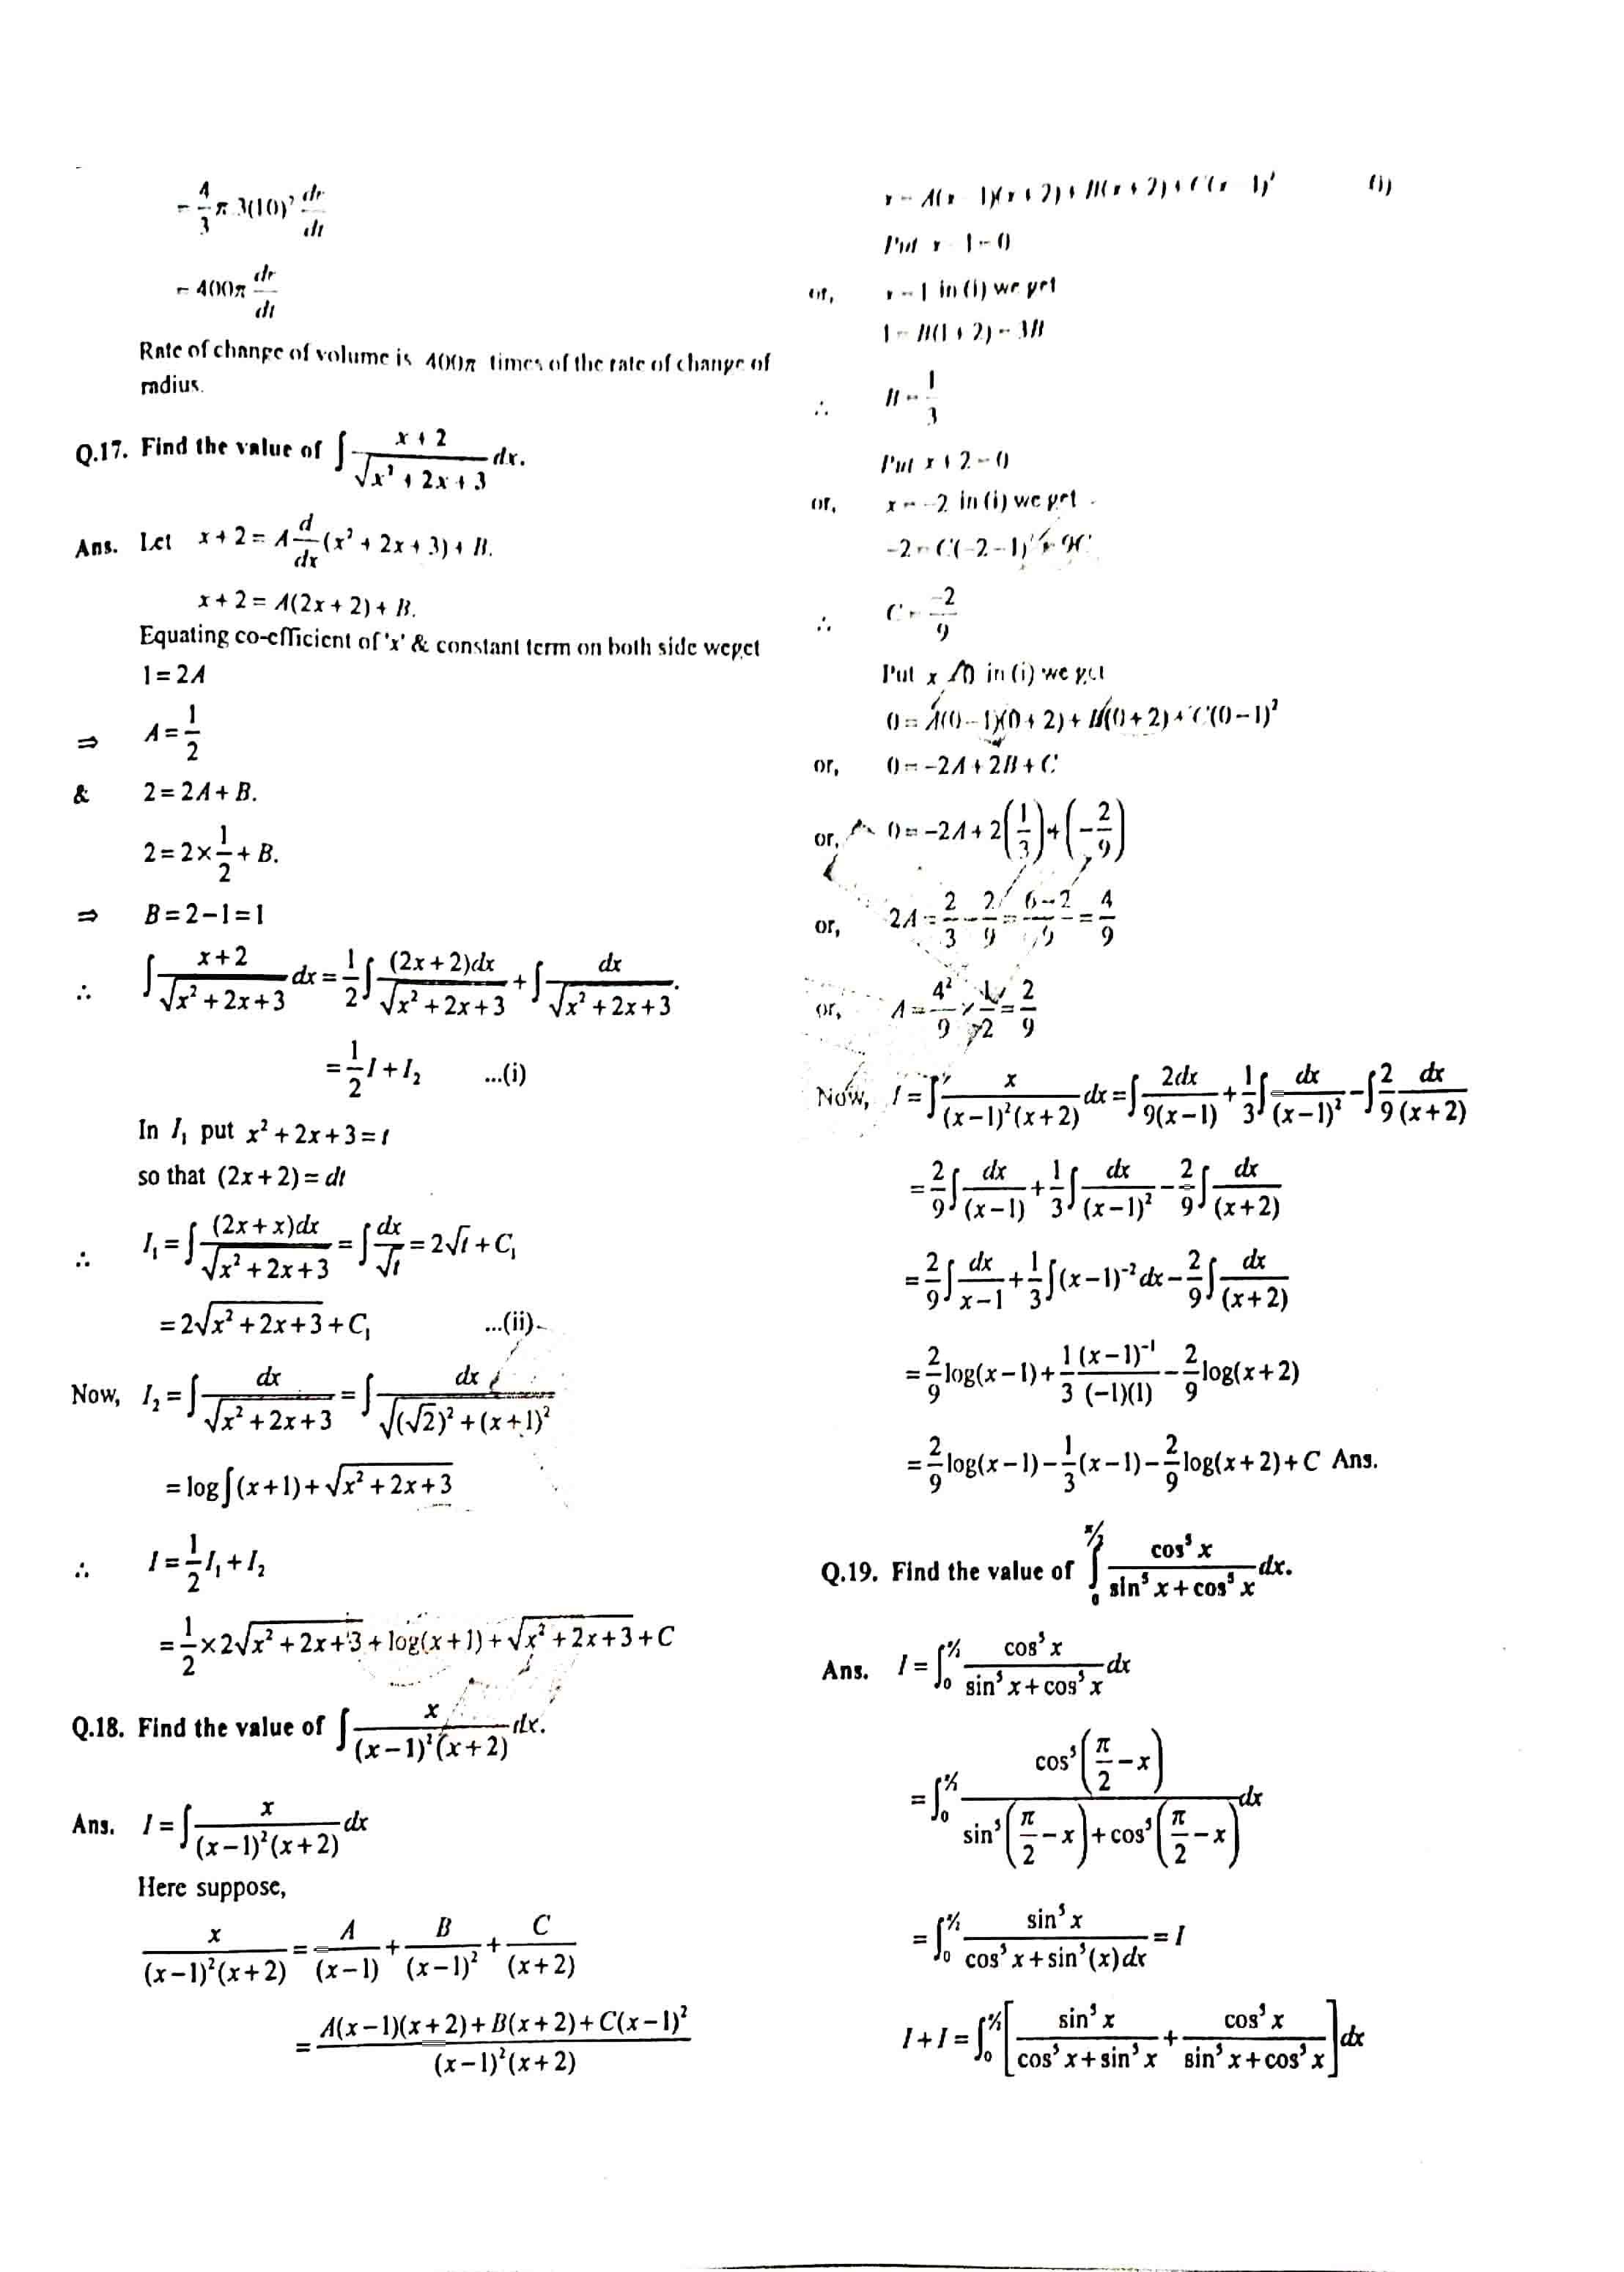 JAC Class 12 math 2017 Question Paper 04